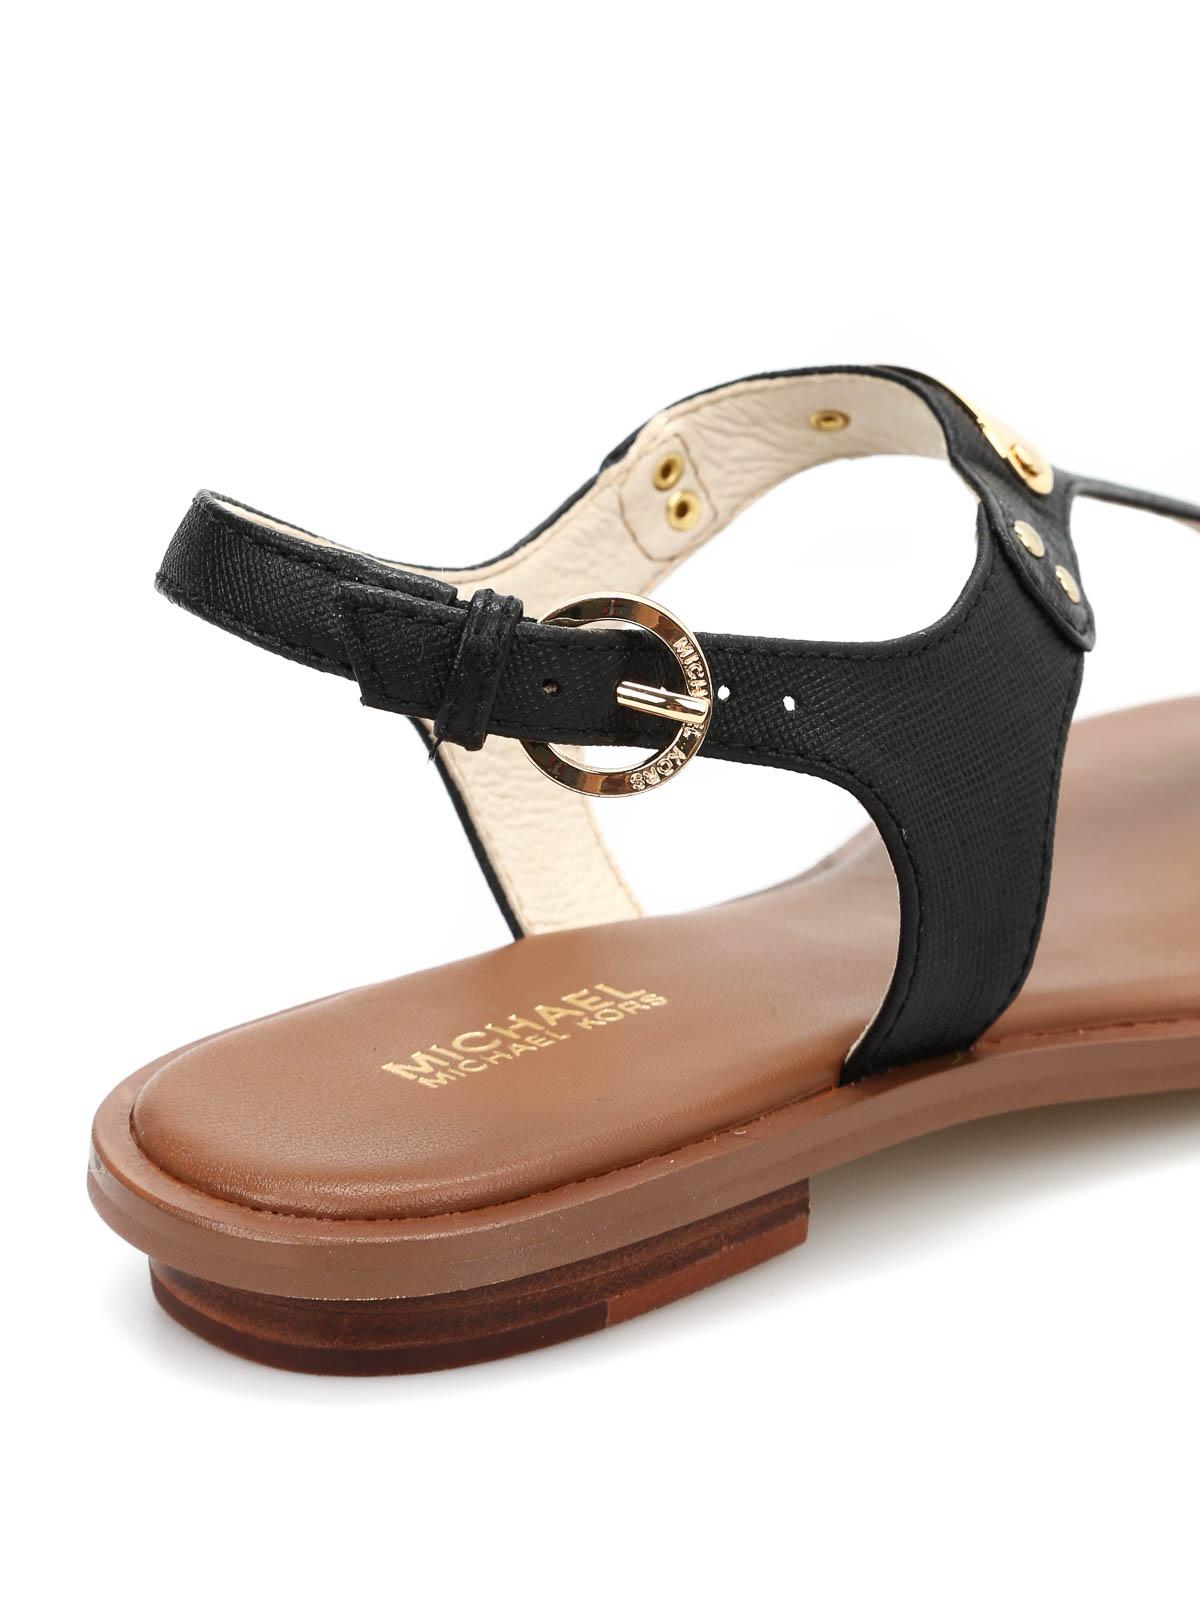 df7cd874f835 Michael Kors - Plate Thong sandals - sandals - 40U2MKFA2L 001 ...